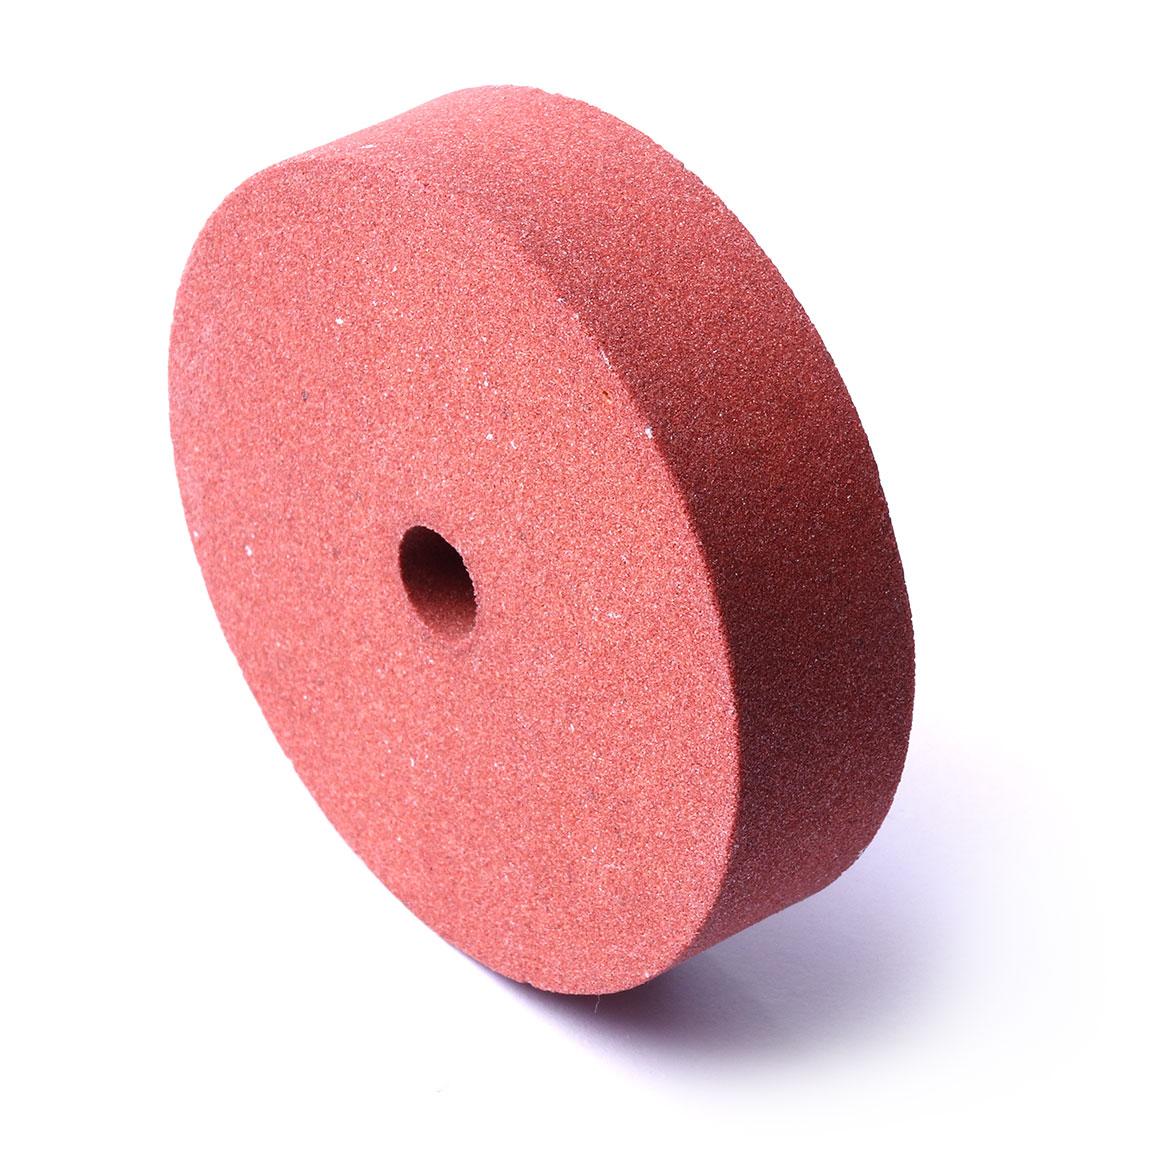 1pcs Grinding Wheel Abrasive Disc Polishing Metal Stone Wheel For Bench Grinders